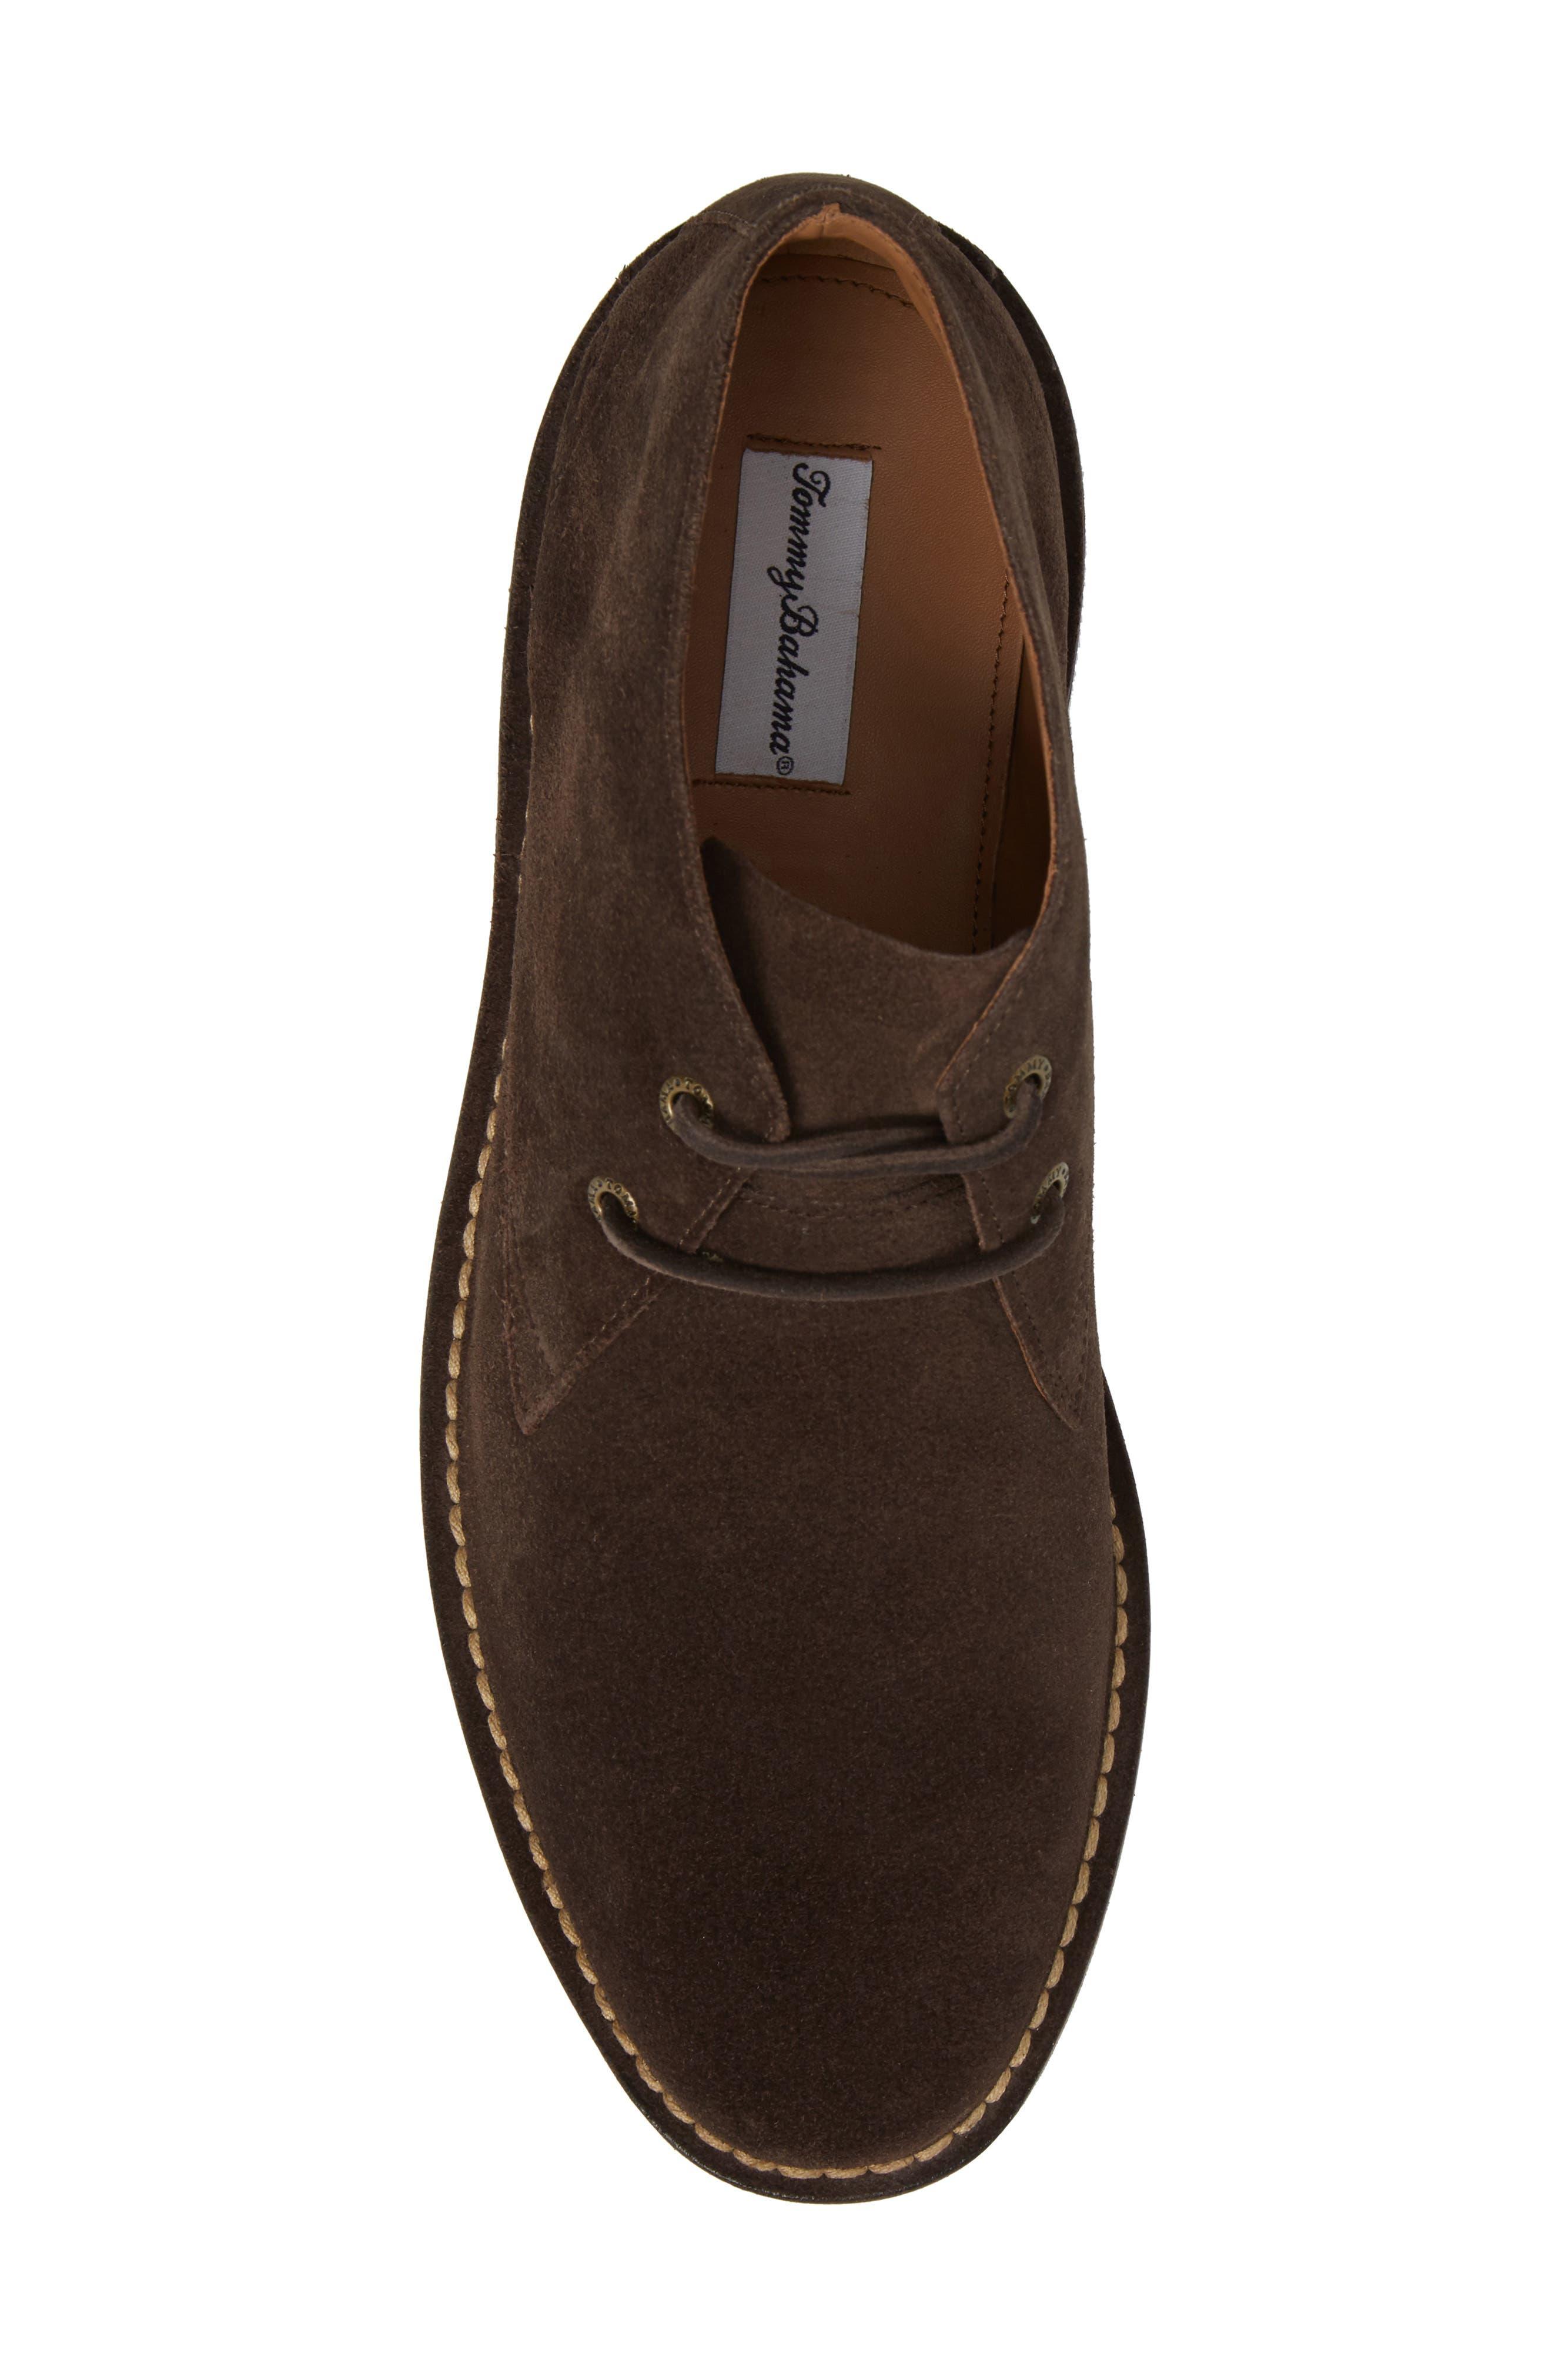 Nassau Chukka Boot,                             Alternate thumbnail 5, color,                             Dark Brown Suede